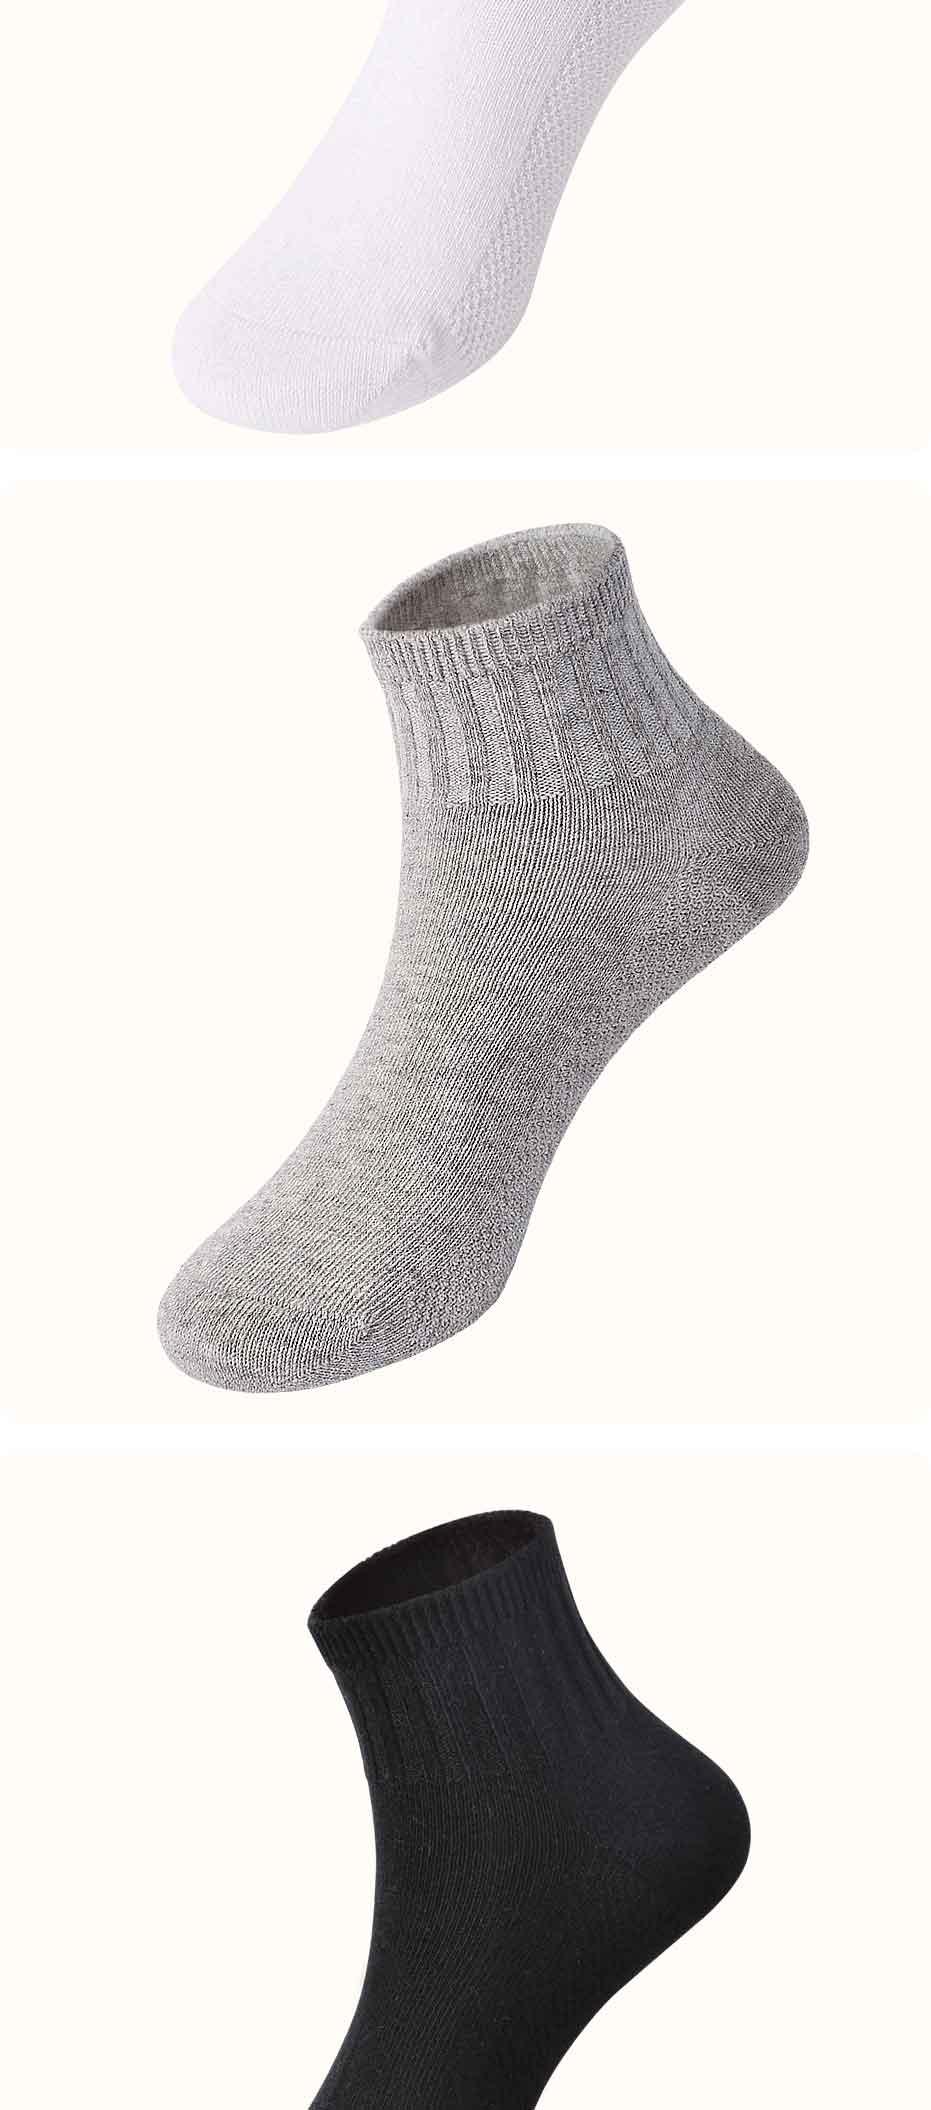 Double-needle-socks-description_05